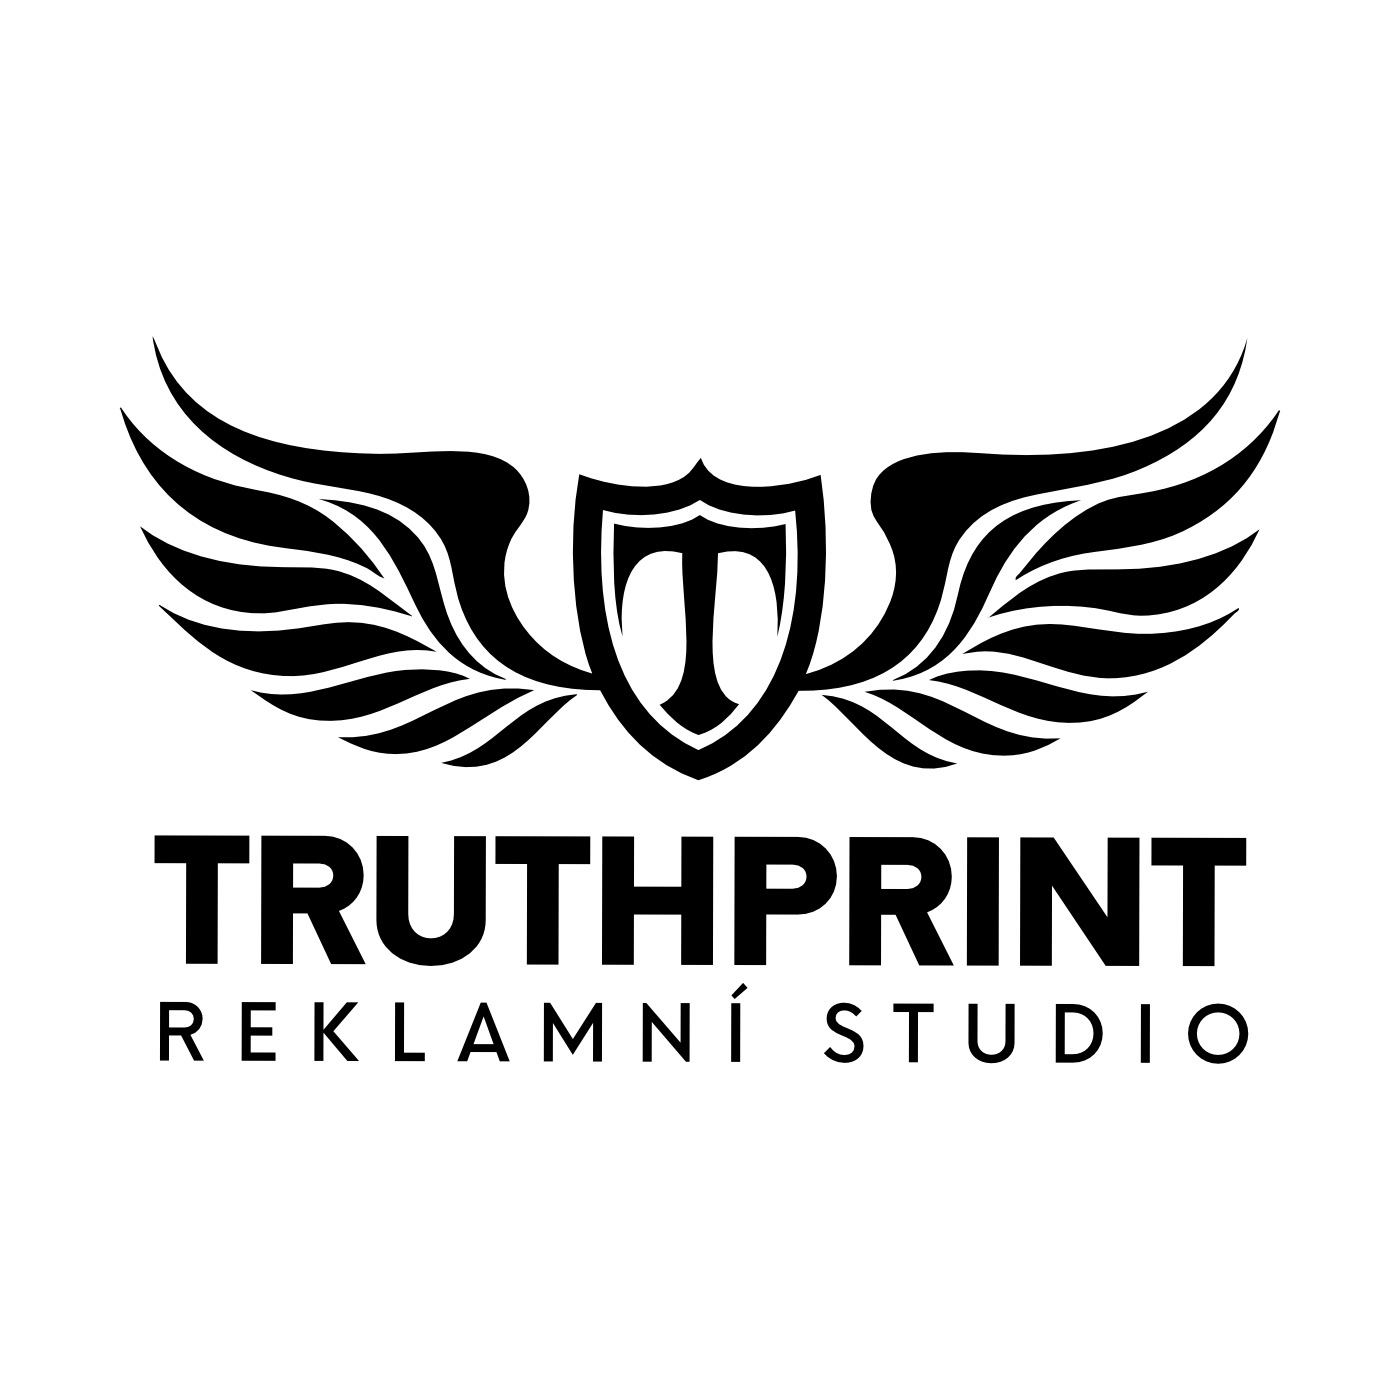 agency design logo print studio truhtprint truth branding  graphic design  Logotype